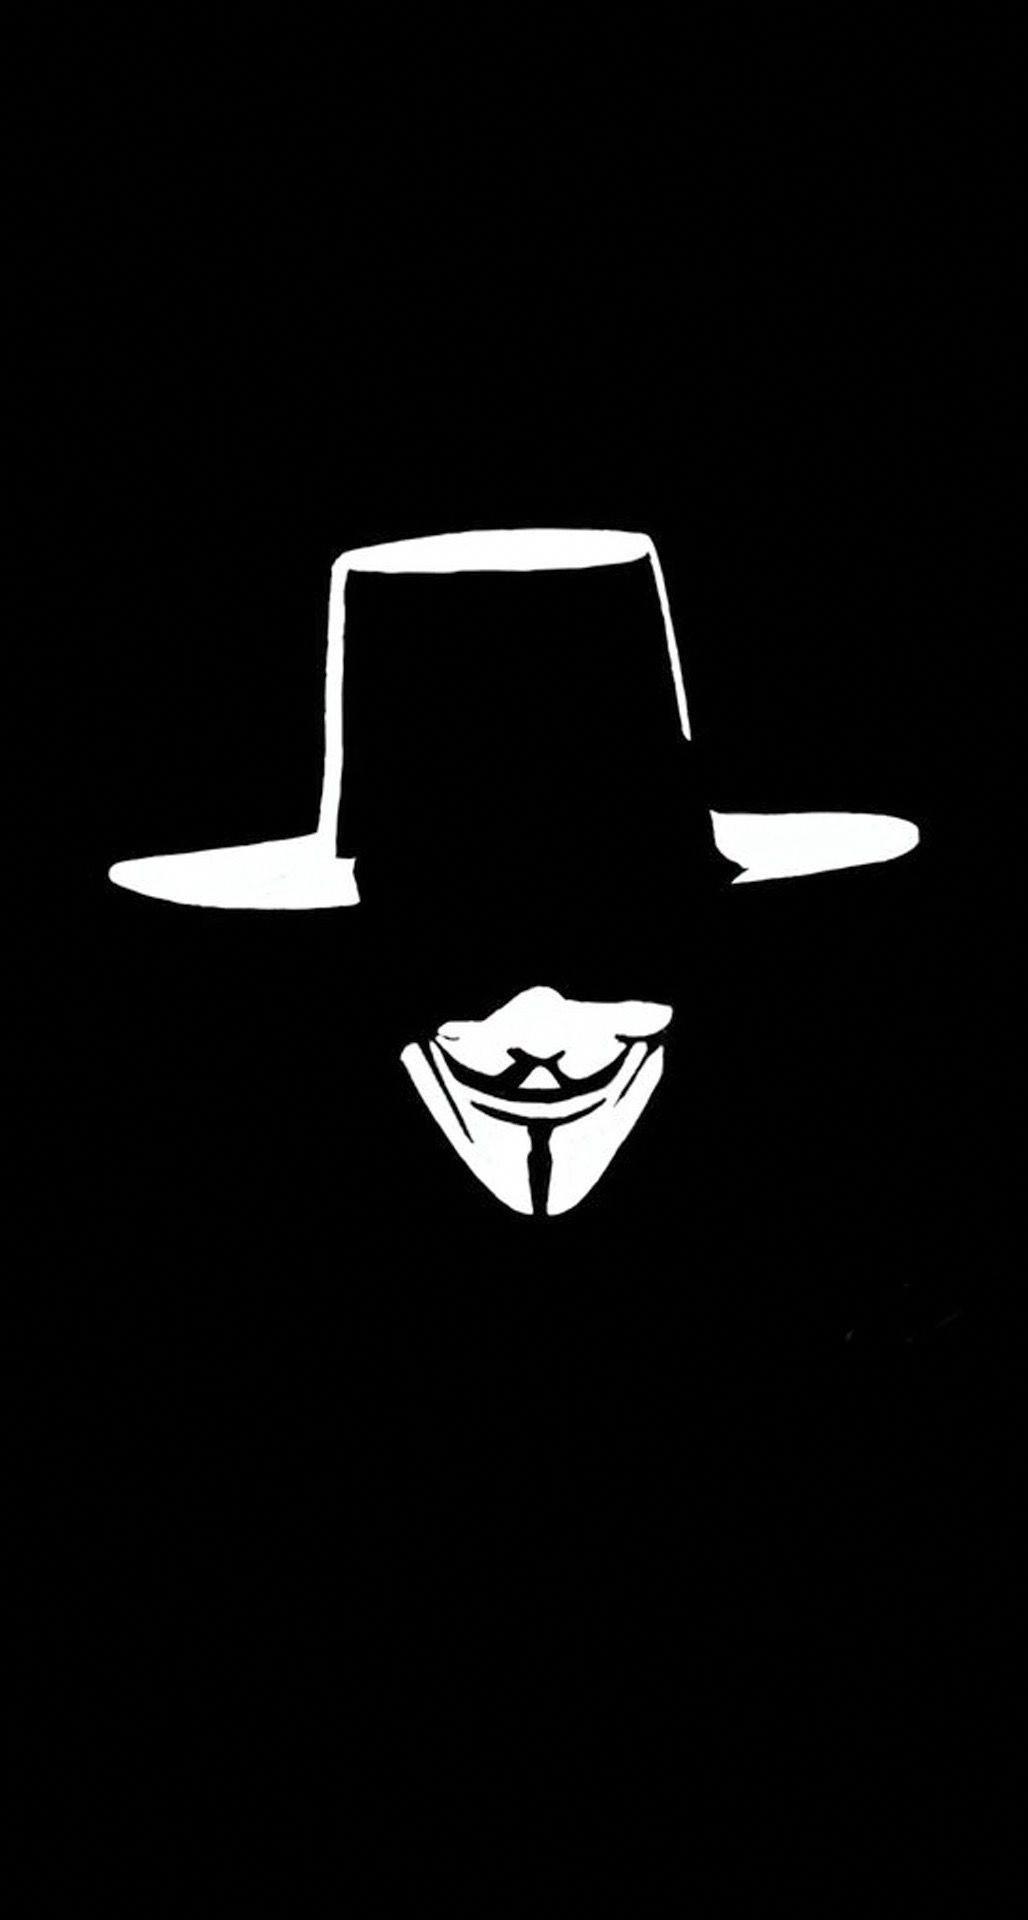 V For Vendetta Hat Face Illustration Iphone 6 Plus Hd Wallpaper Iphone 6s Wallpaper Iphone Wallpaper Vintage Cool Iphone 6 Wallpapers